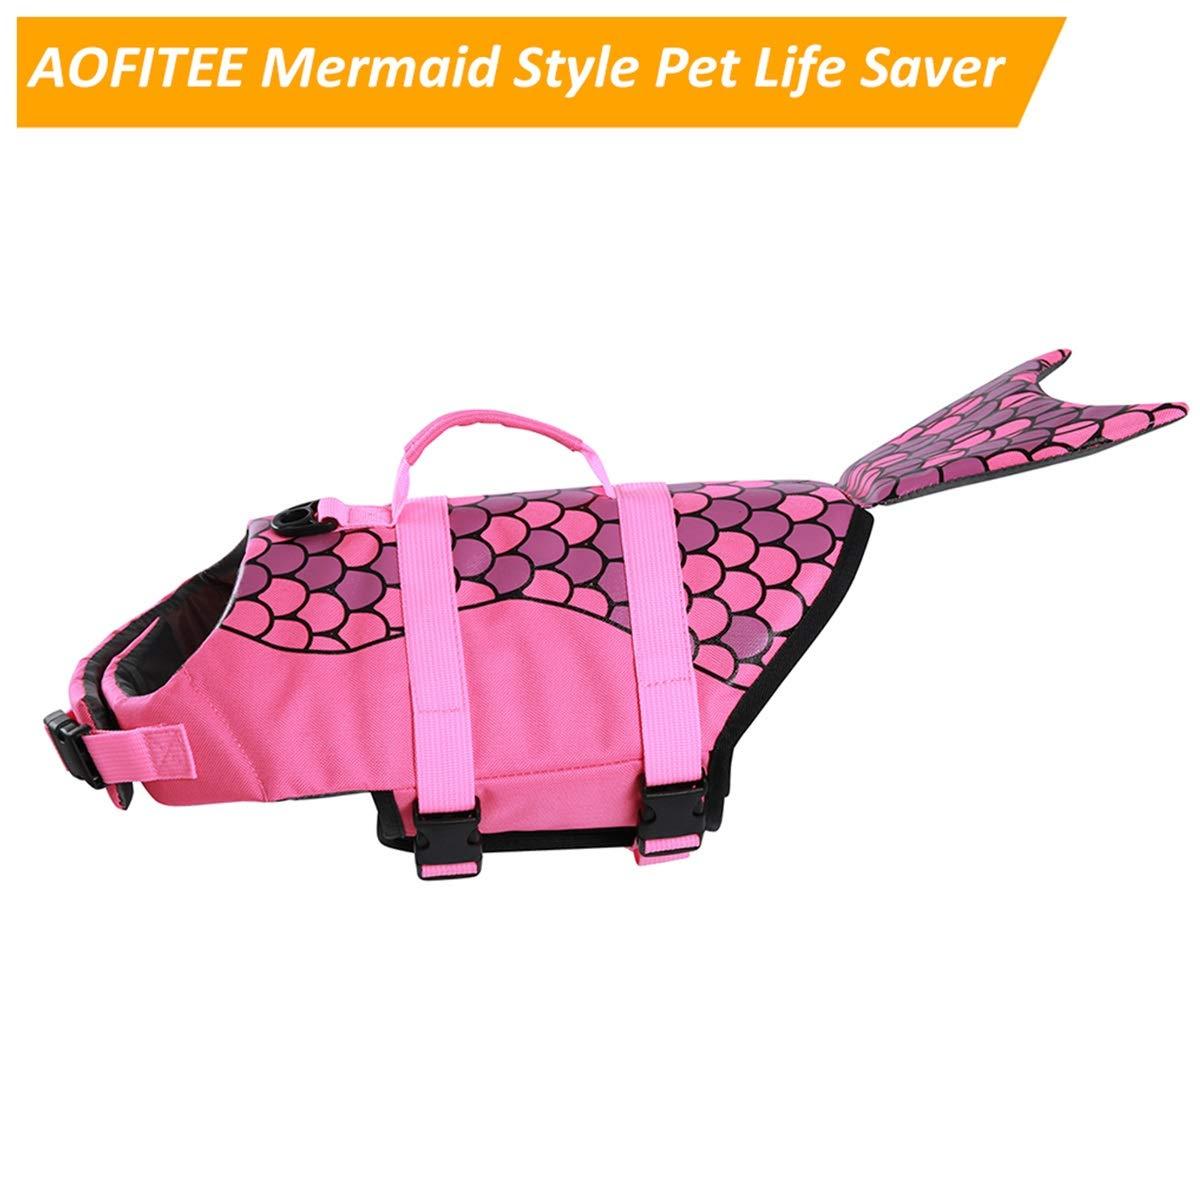 Adjustable Dog Lifesaver Ripstop Pet Life Preserver with Rescue Handle for Small Medium and Large Dogs AOFITEE Dog Life Jacket Pet Safety Vest 5 Sizes